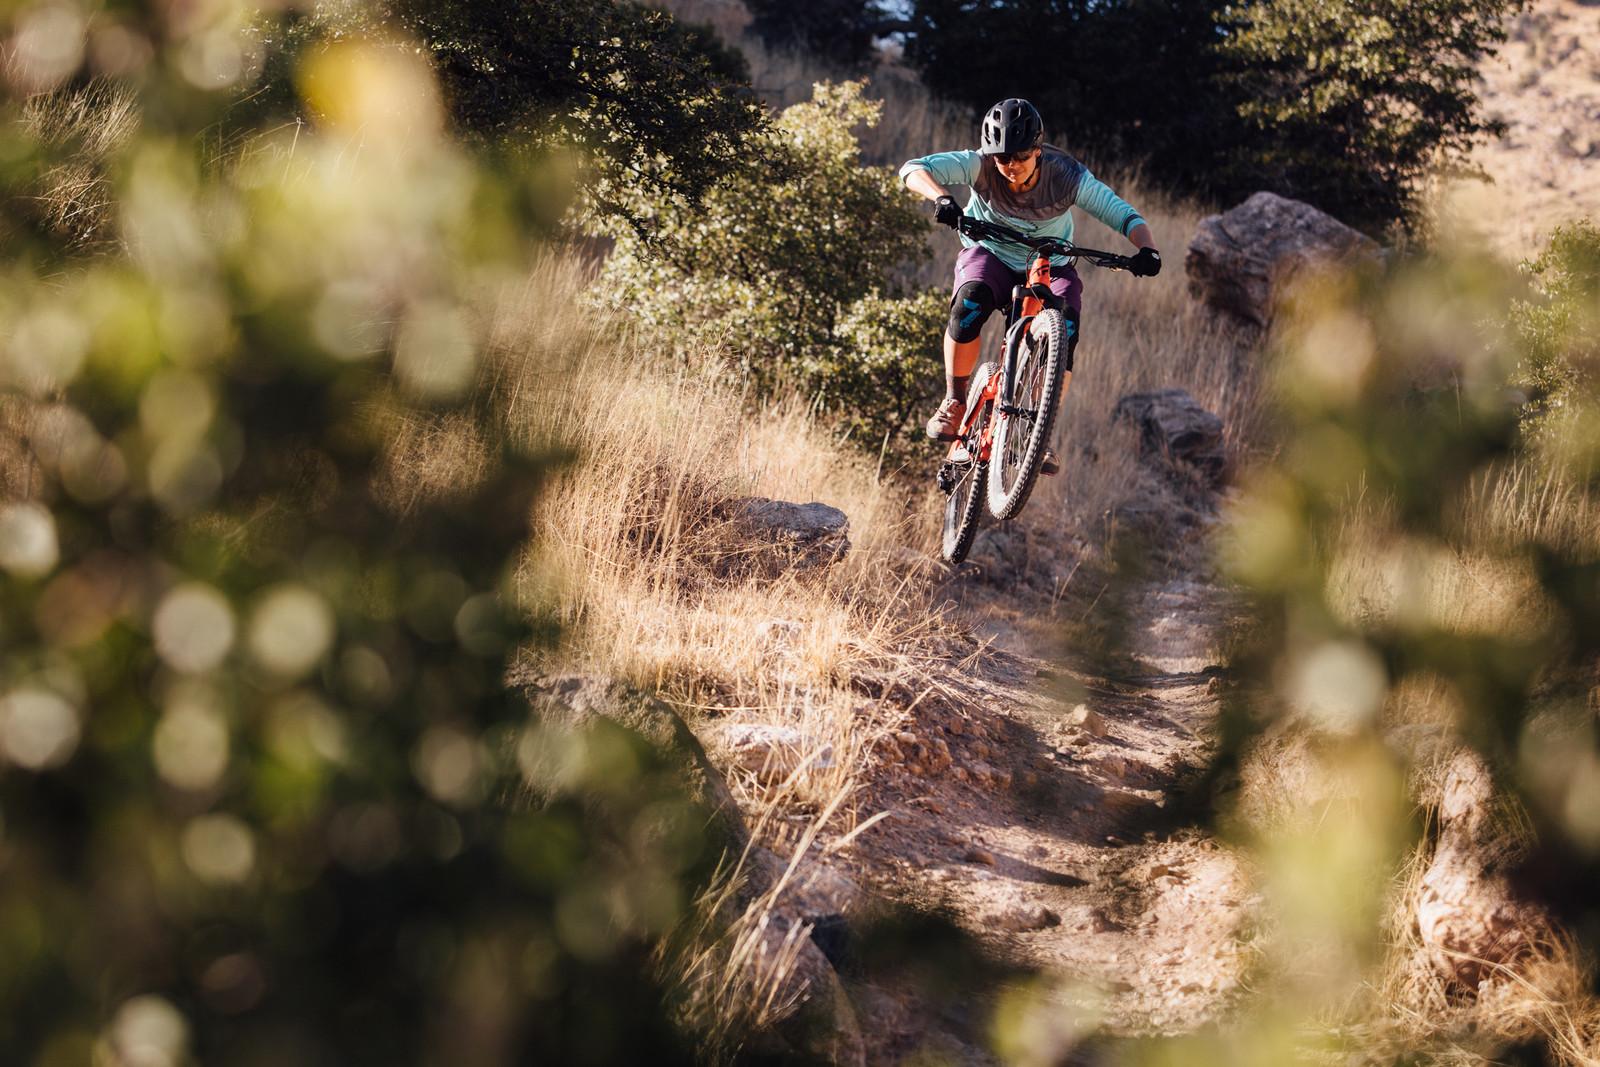 Transition Scout Carbon #3 - 2017 Vital MTB Test Sessions - Transition Scout Carbon #3 - 2017 Vital MTB Test Sessions - Mountain Biking Pictures - Vital MTB